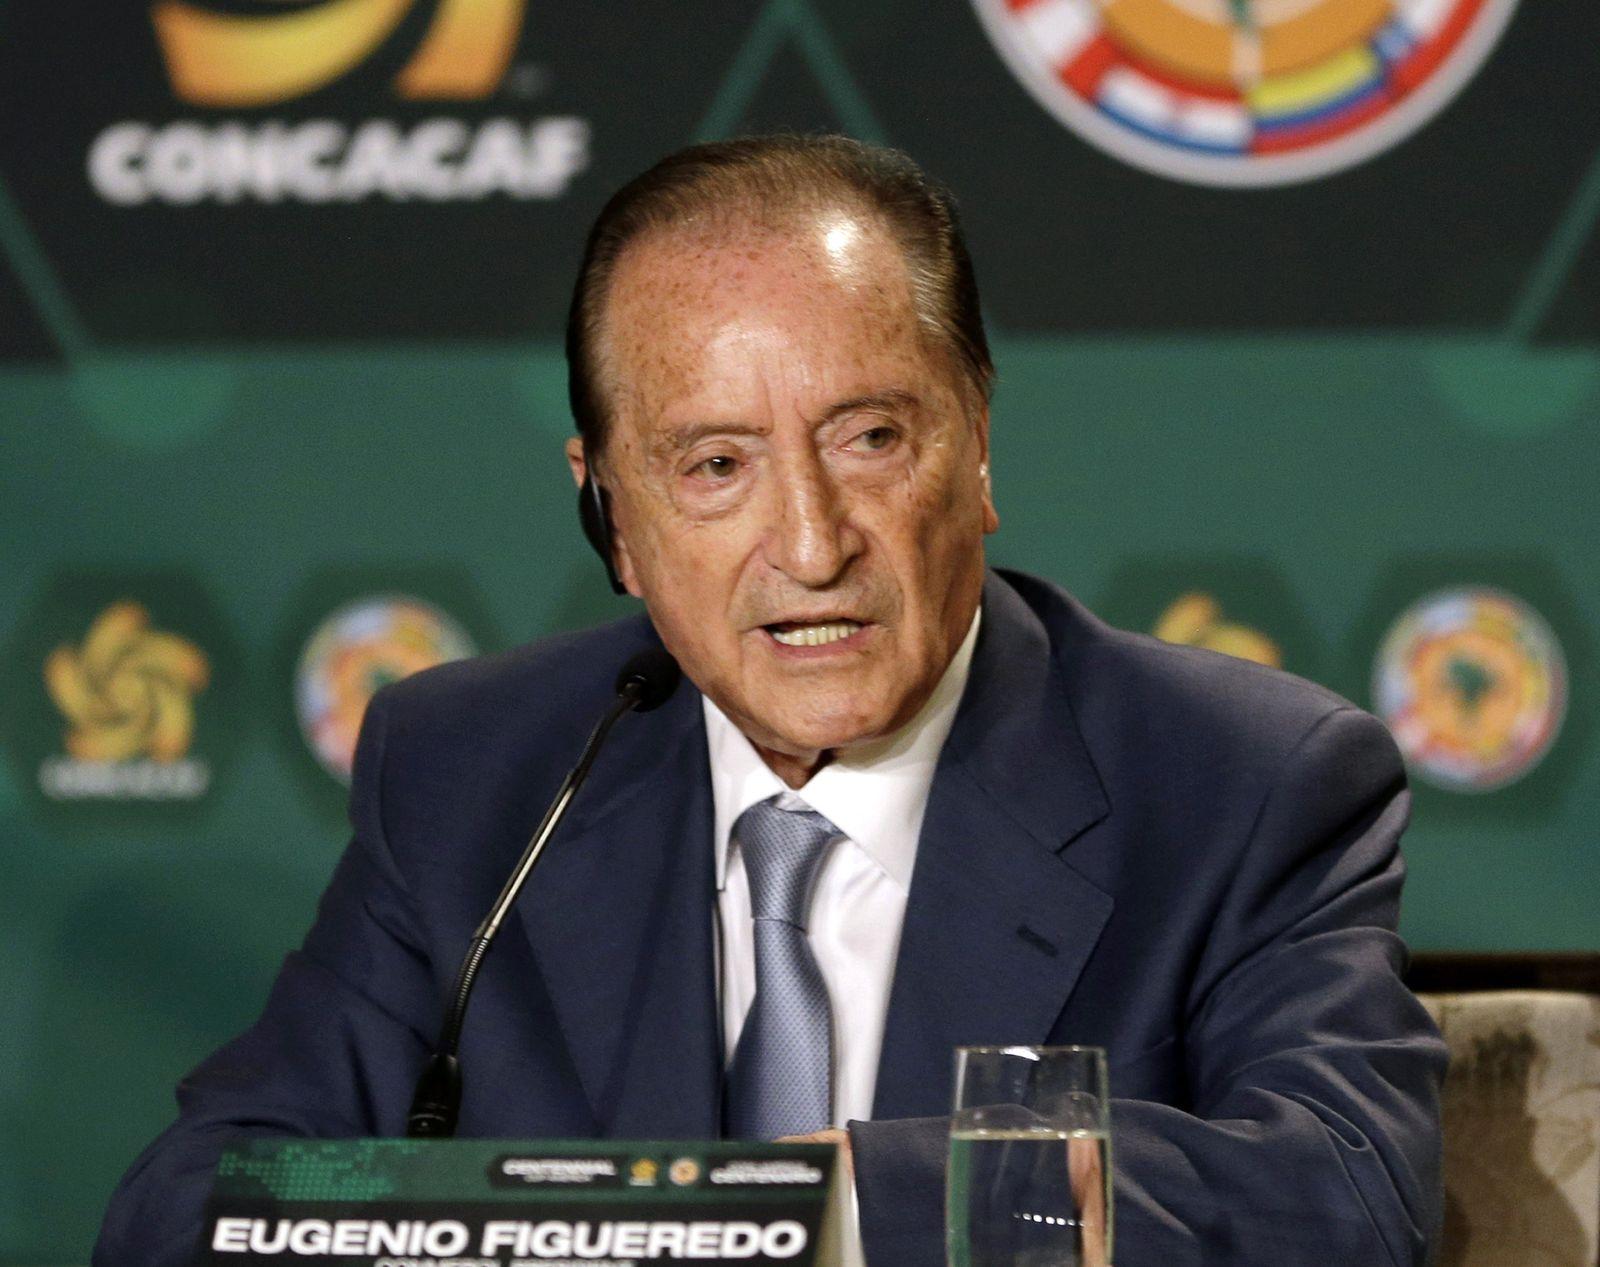 Eugenio Figueredo, Fifa